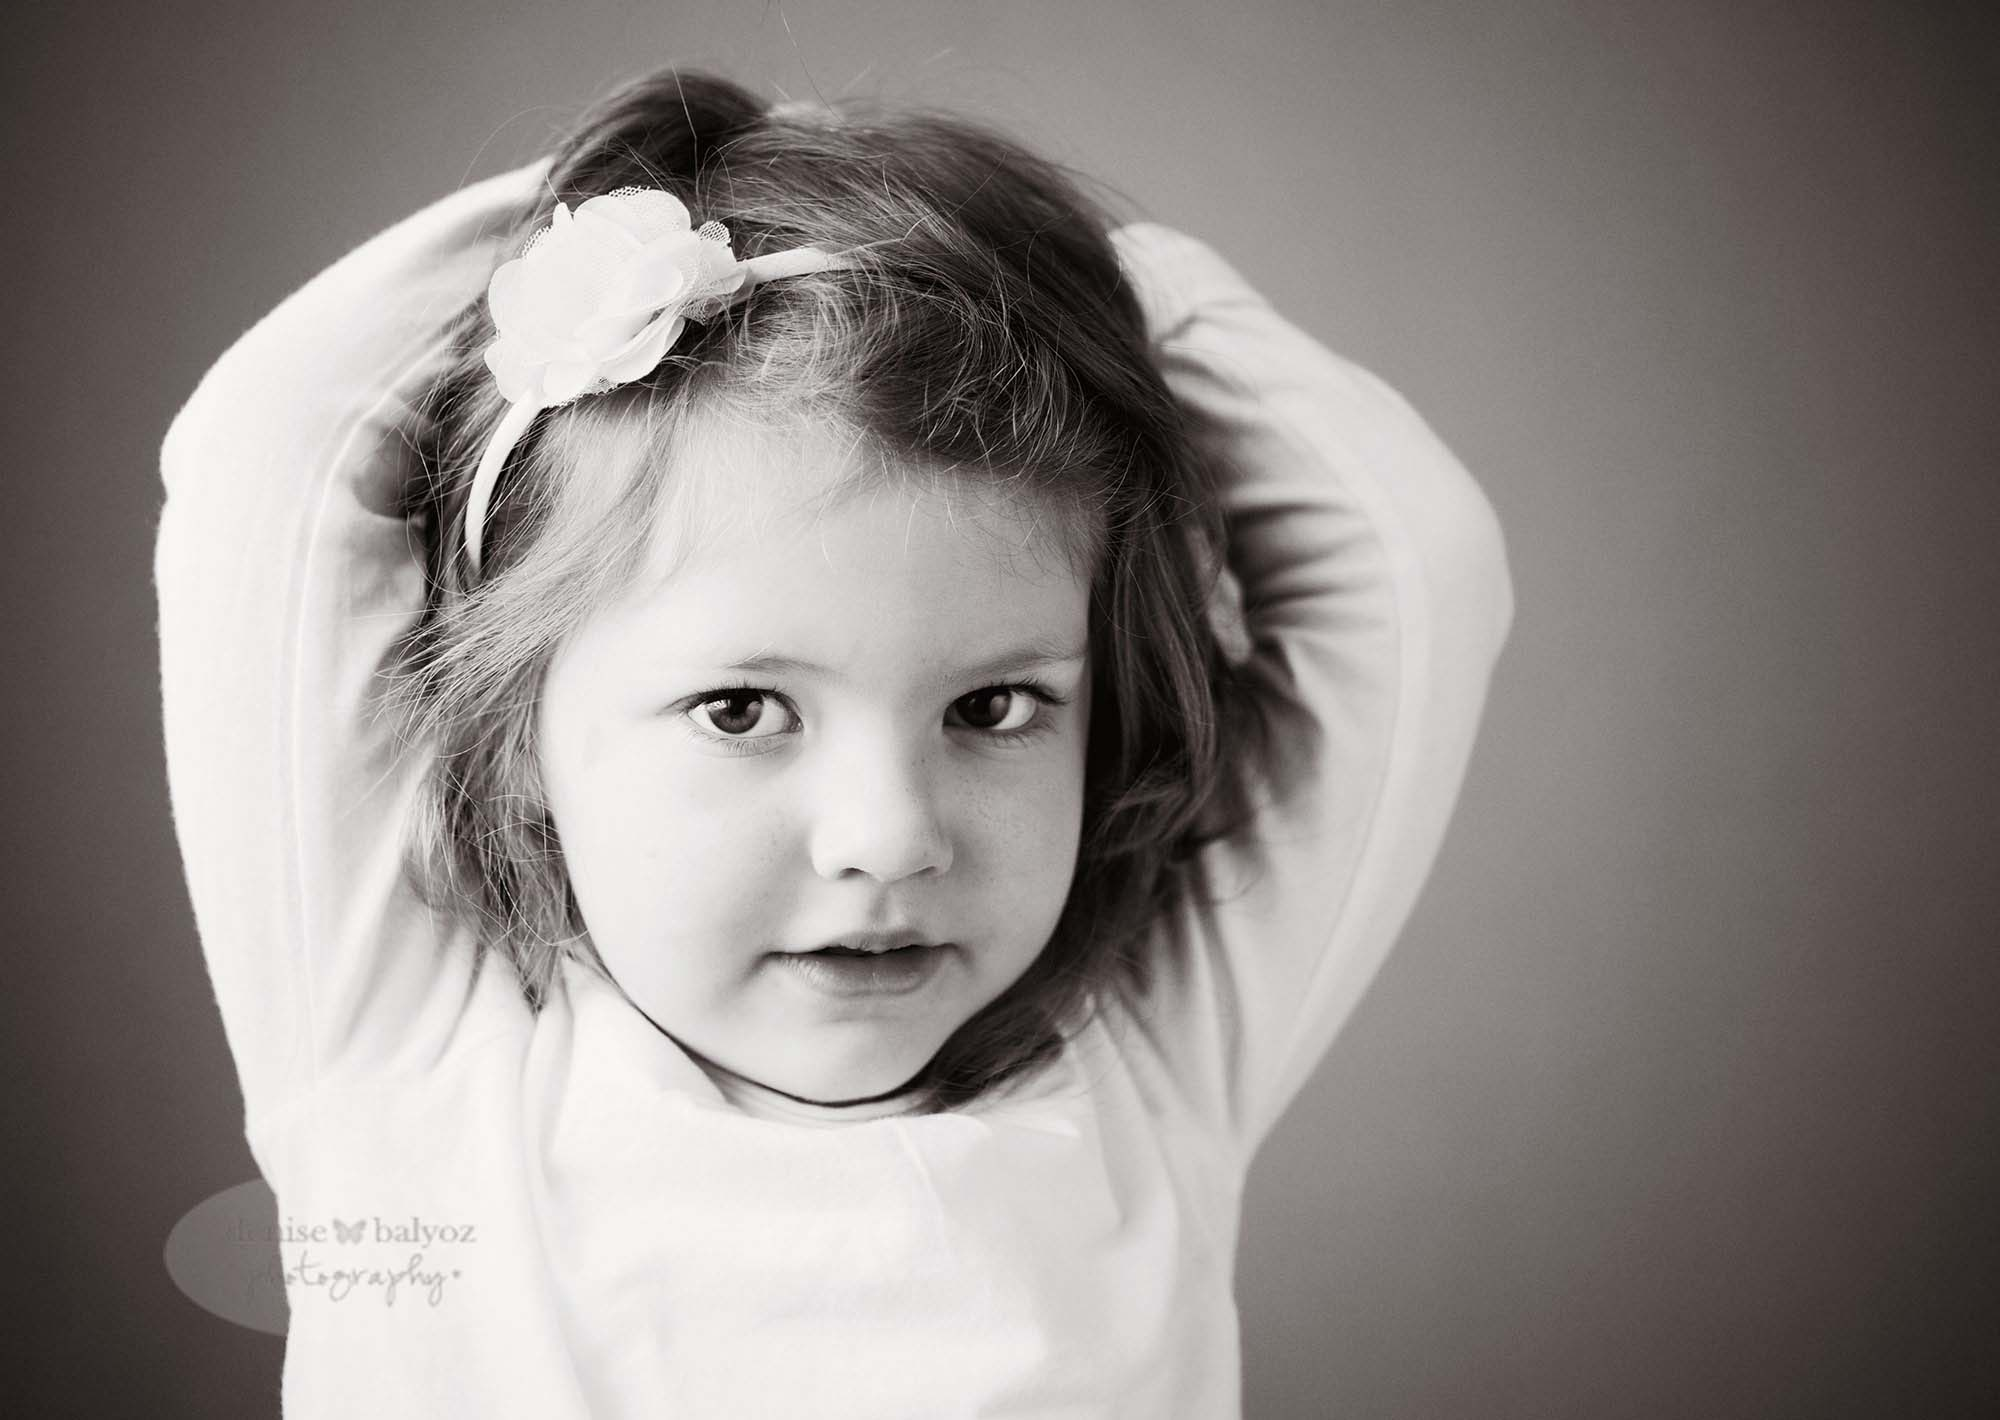 virginia-water-kids-photographer.jpg